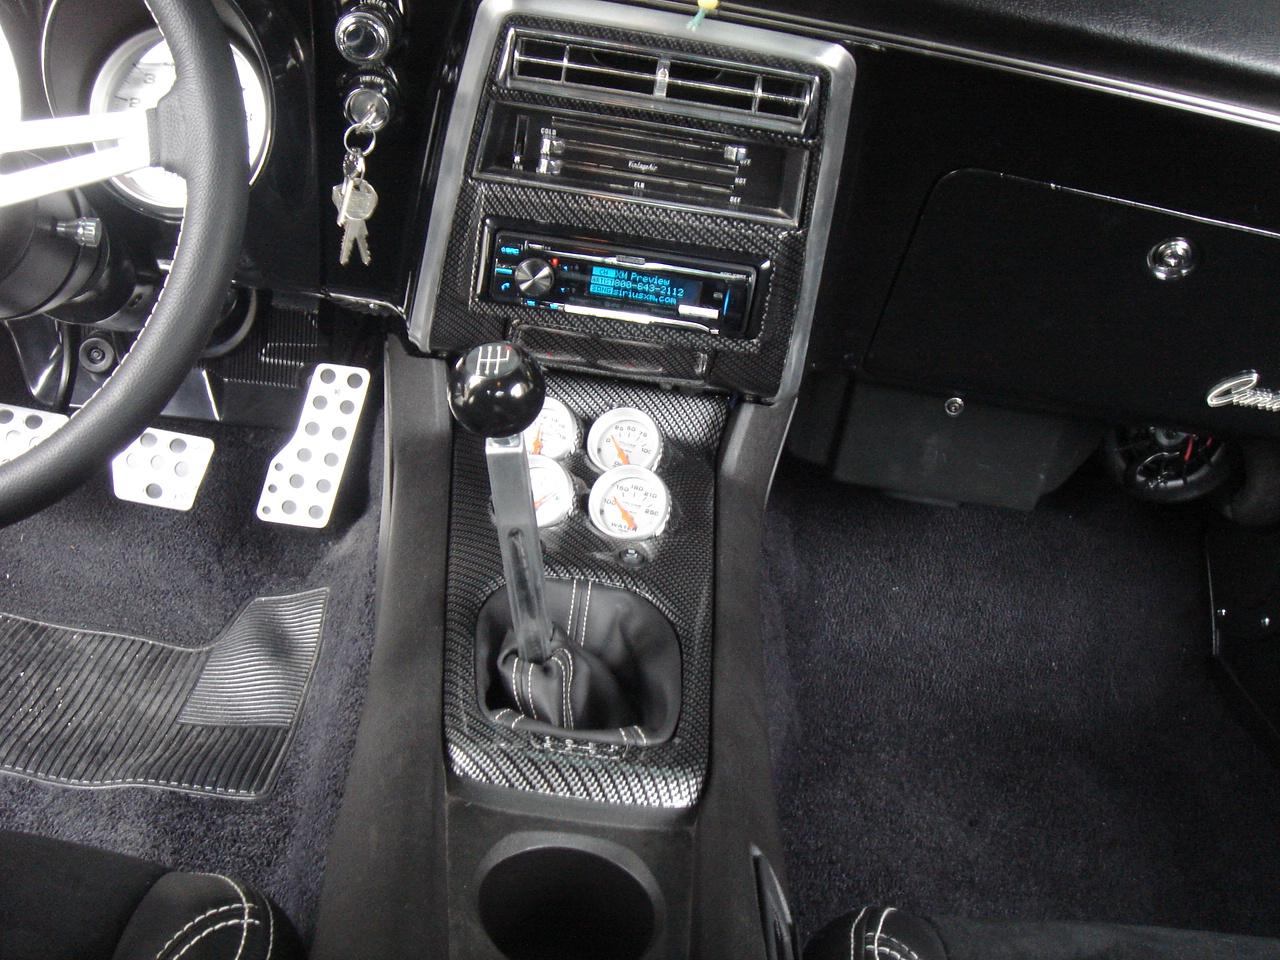 A Few Interior Pics Of My 68 Camaro With Single Din Radio